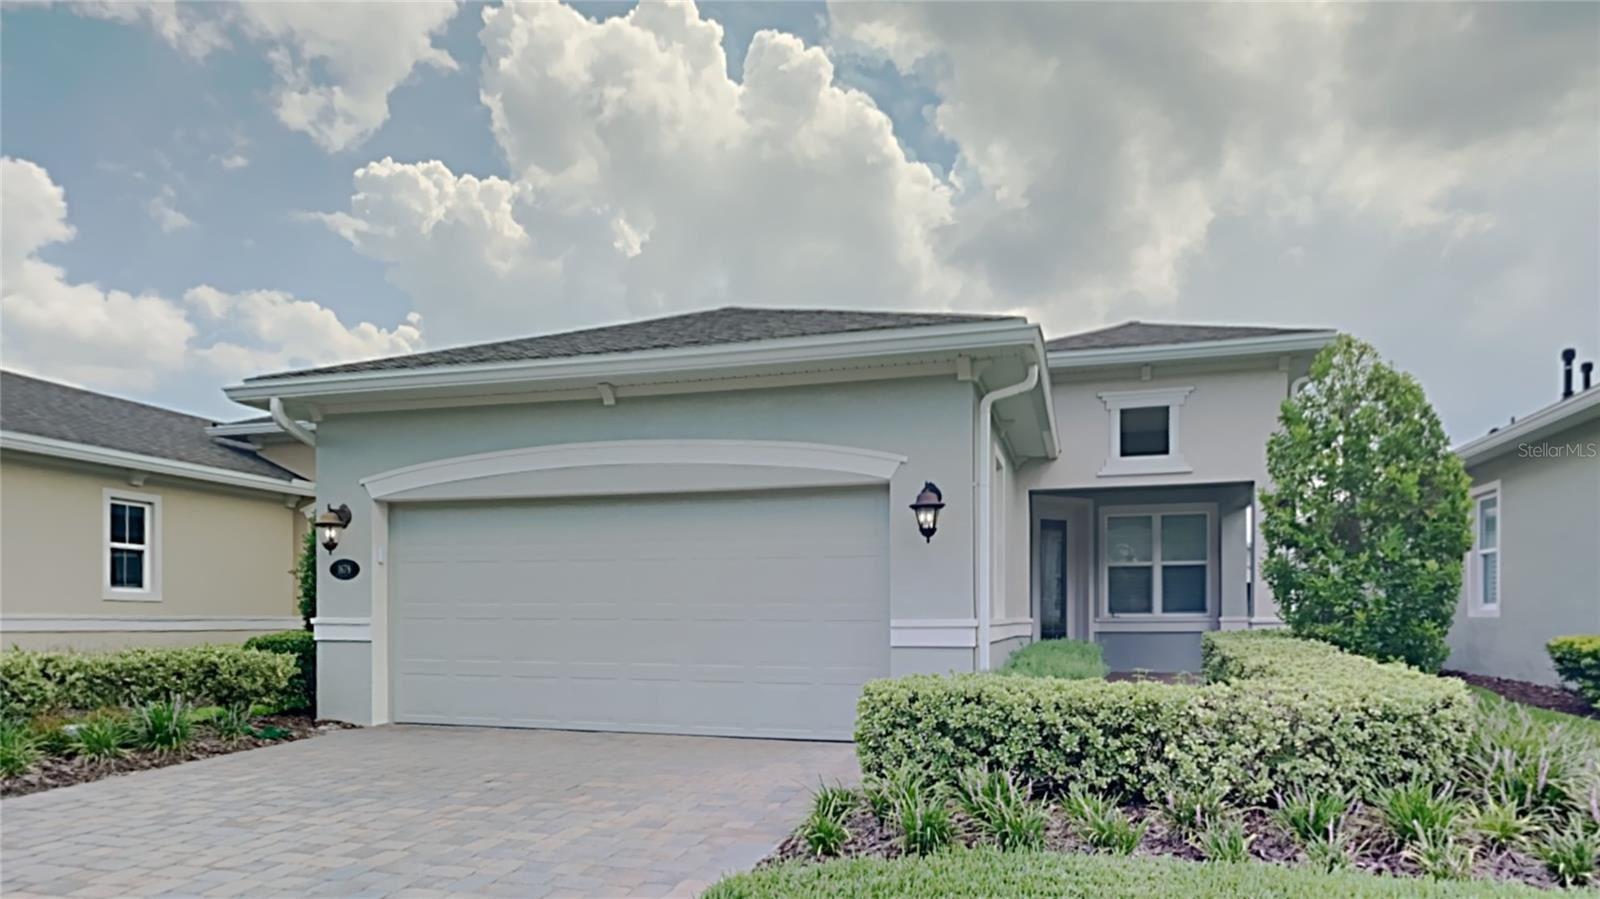 1679 VICTORIA GARDENS DRIVE, Deland, FL 32724 - MLS#: T3320883